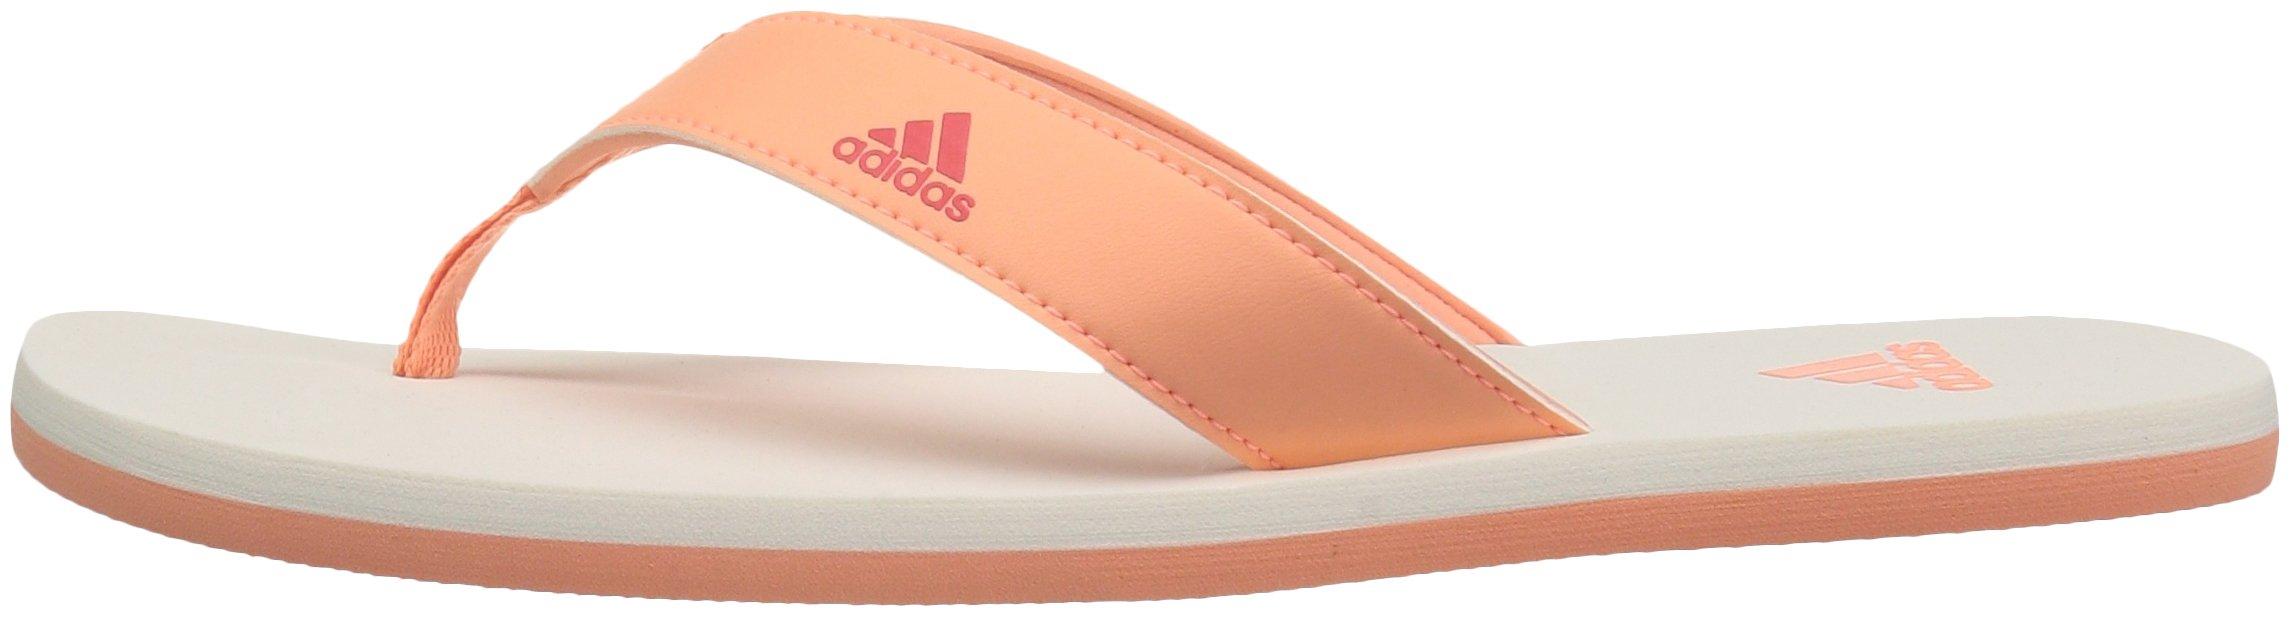 adidas Performance Unisex-Kids Beach Thong 2 K, White/Hi-Res Blue/White, 13 M US Little Kid by adidas (Image #5)